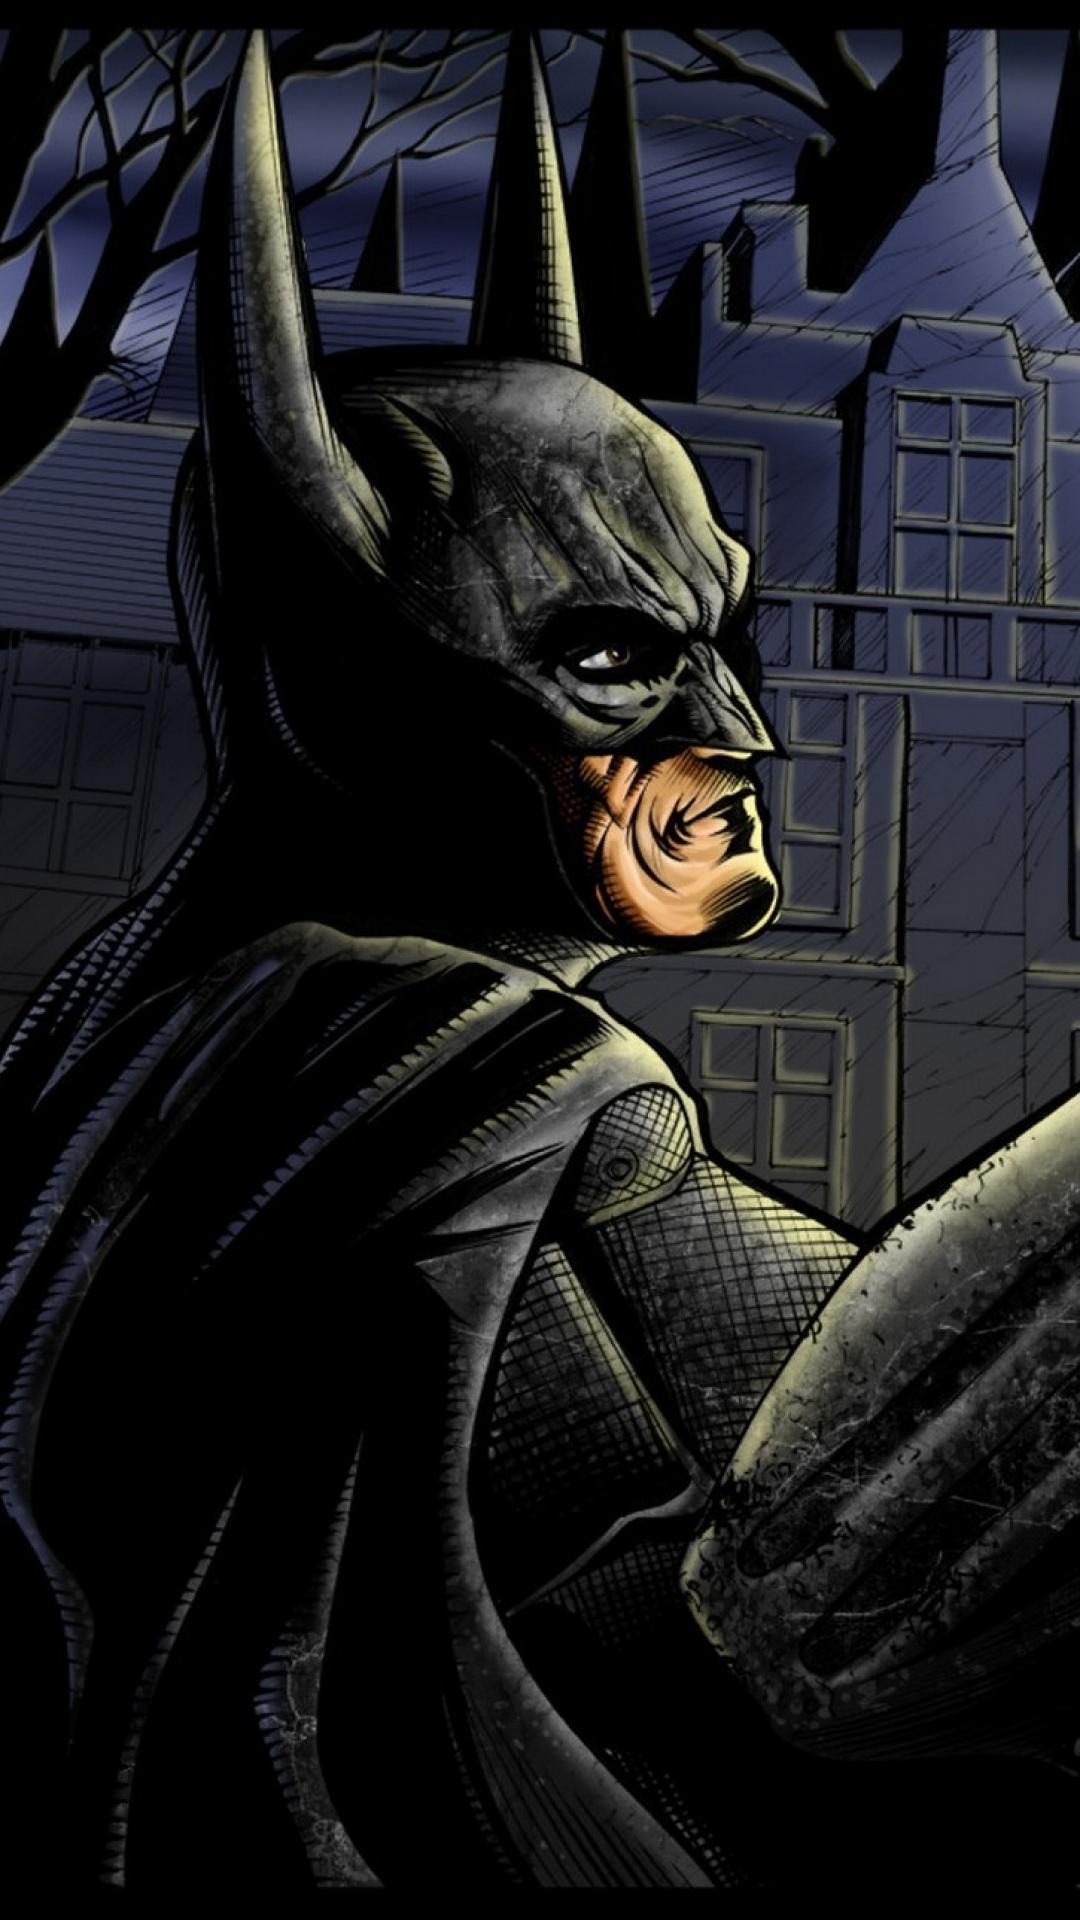 Joker Wallpaper batman arkham asylum batman joker 108733 ...